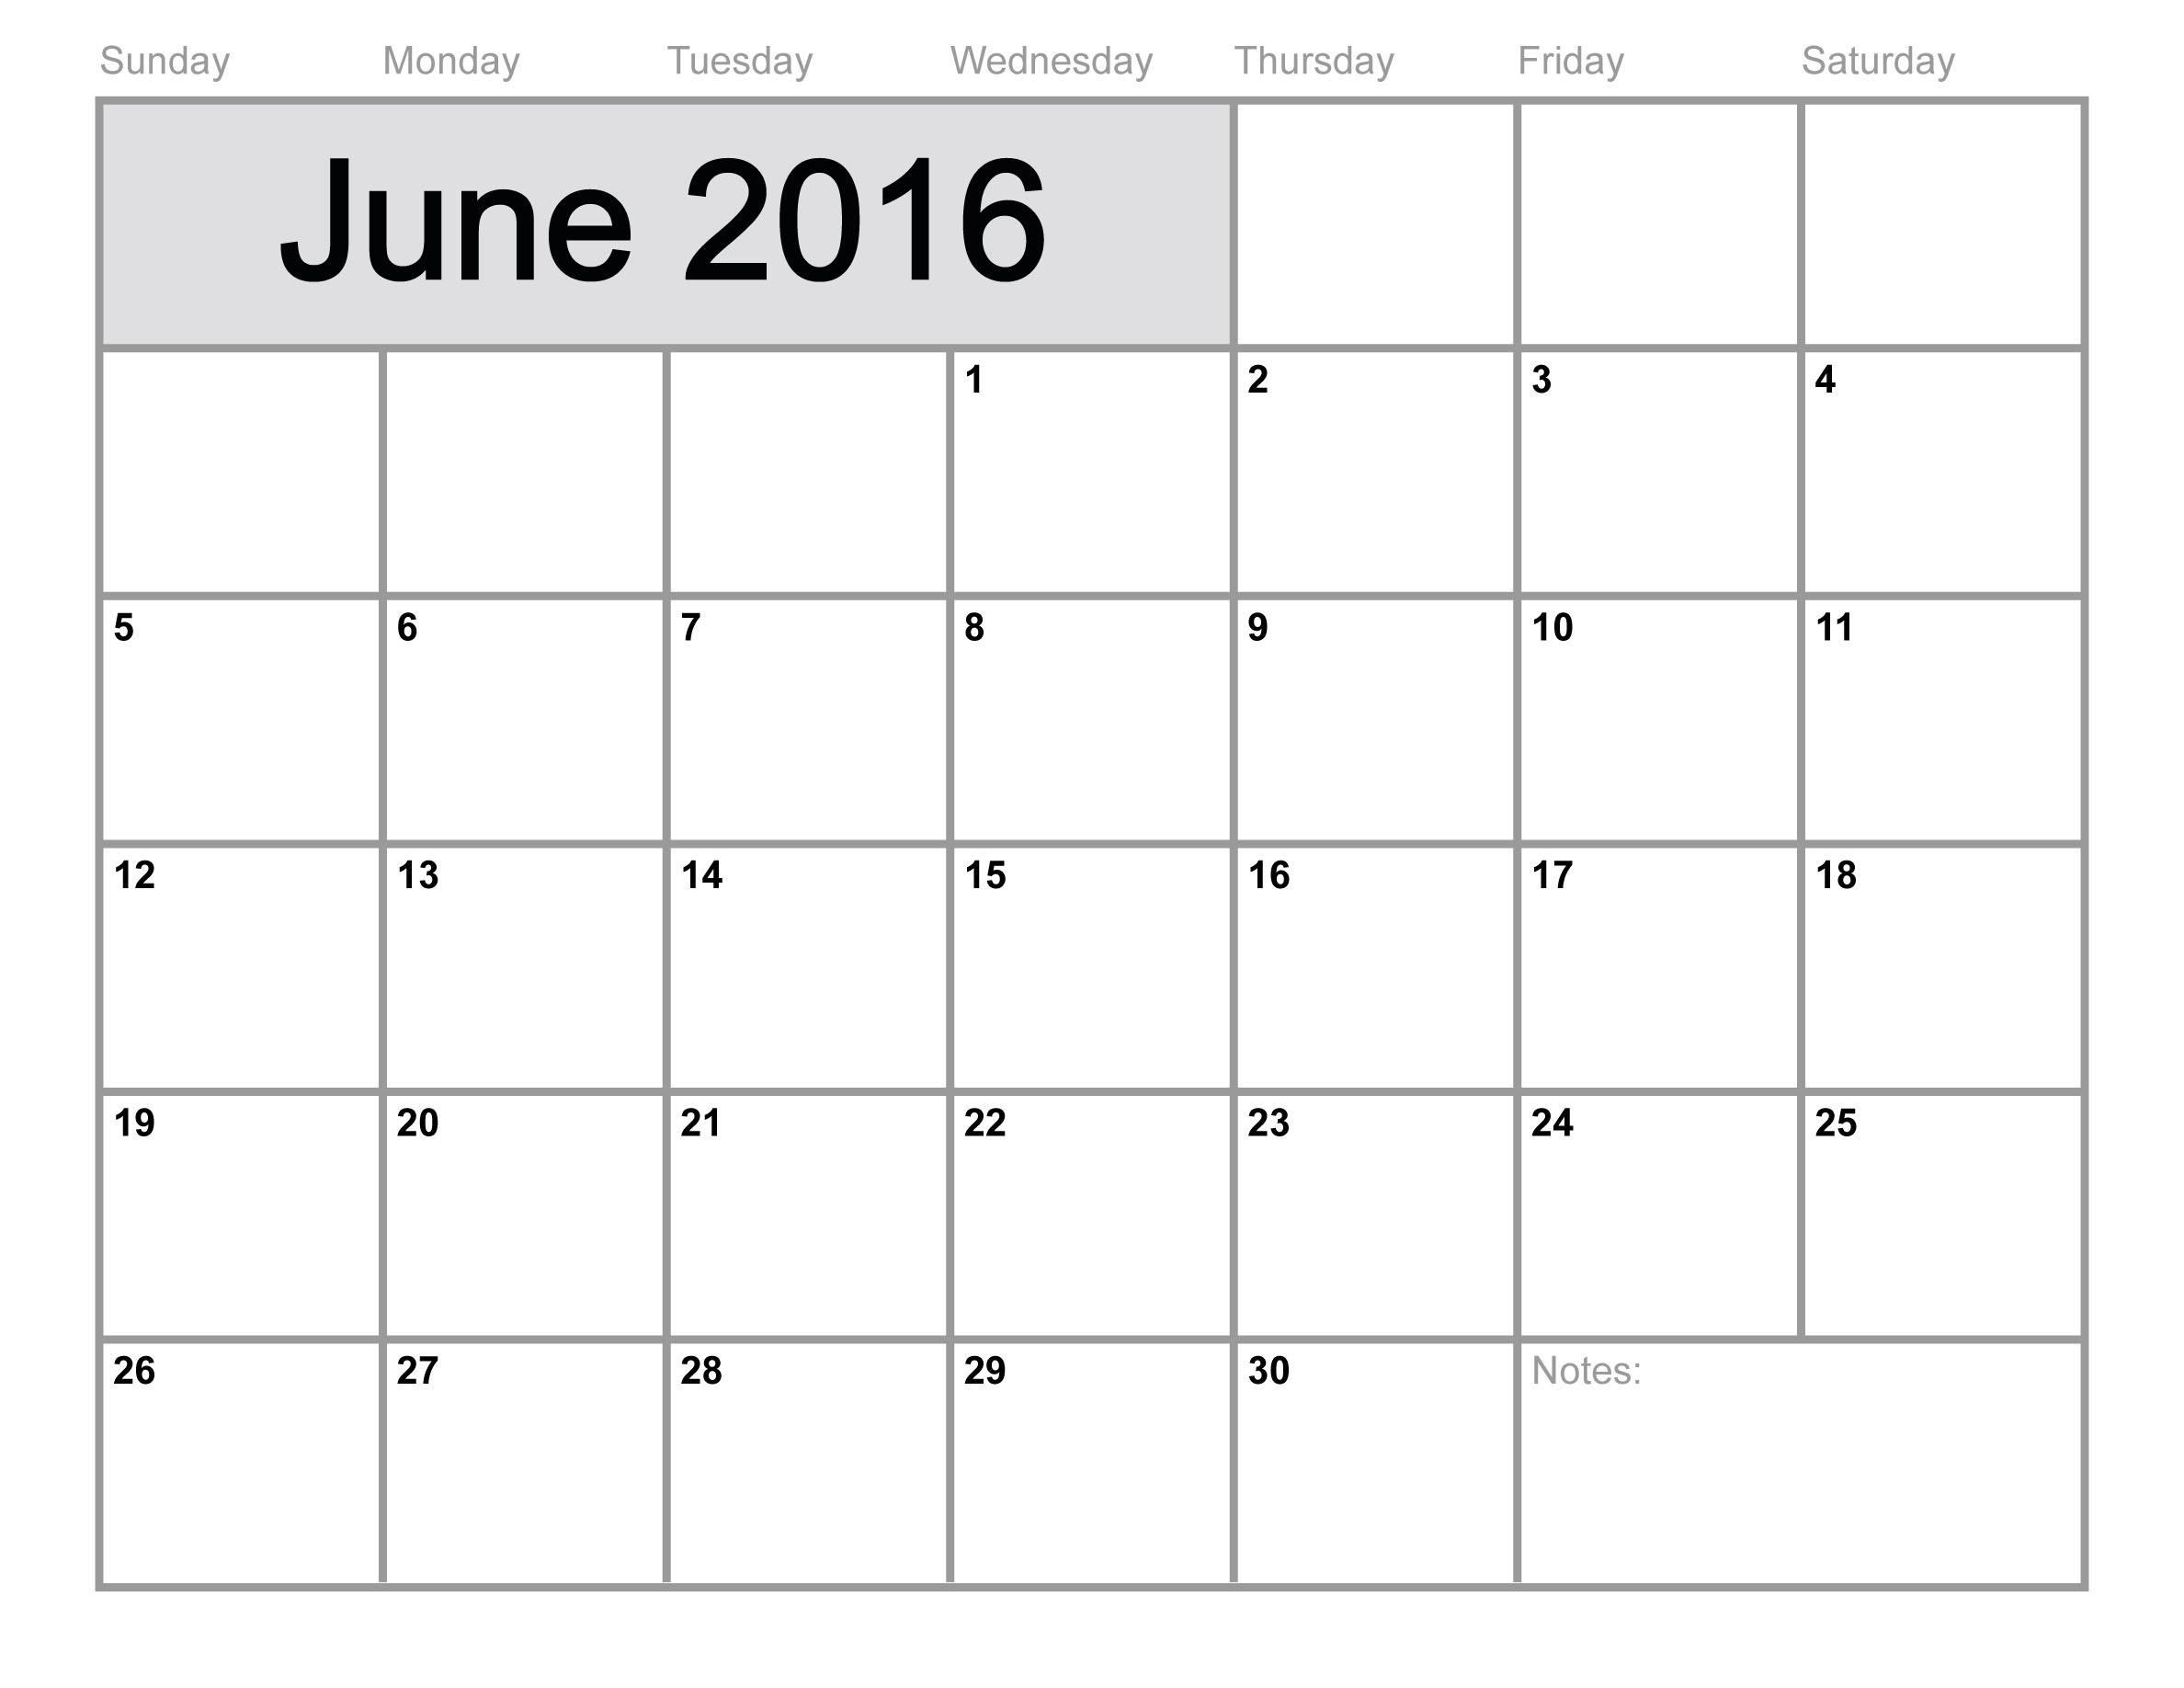 Monthly Calendar Templates For Teachers Blank Monthly Calendar Office Templates Blank June 2016 Calendar Printable Calendar Template 2017